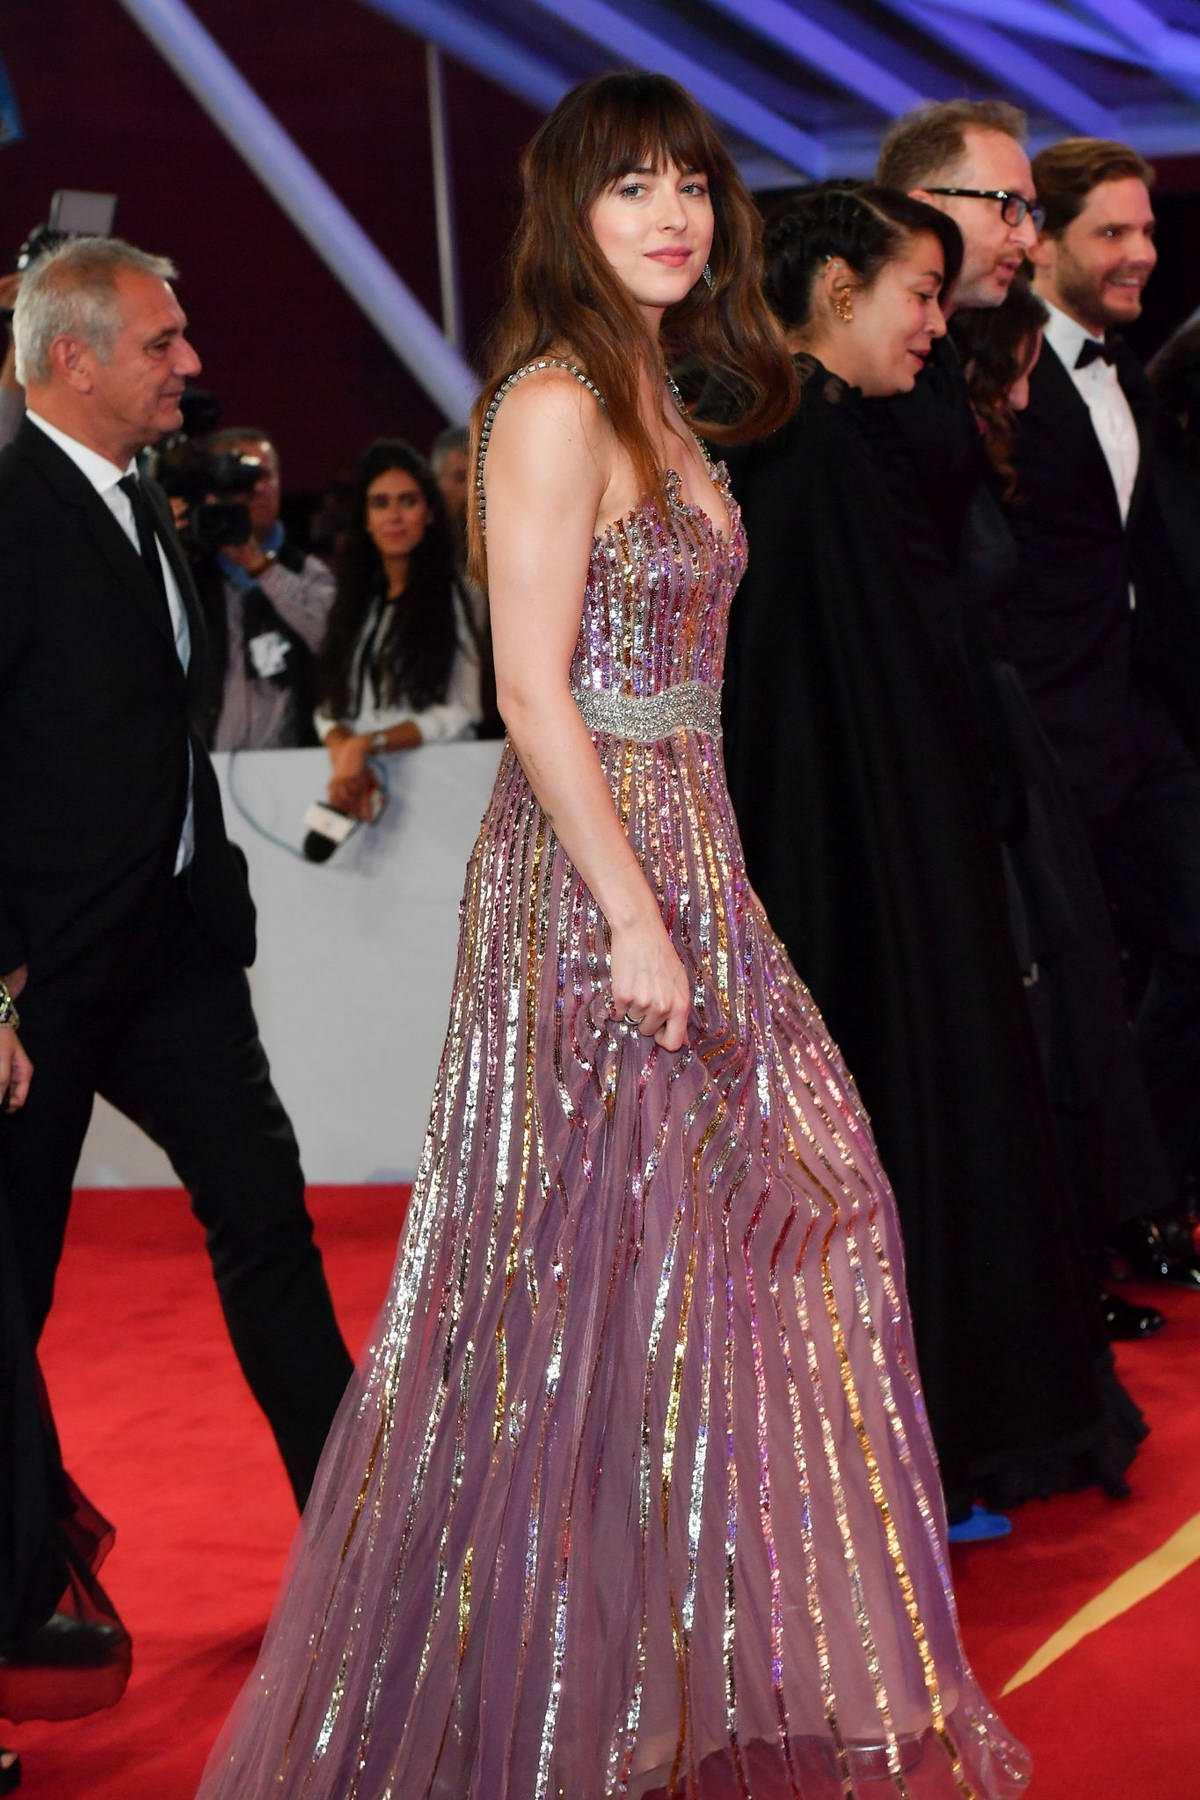 Dakota Johnson attends the 17th Marrakech International Film Festival Opening Ceremony in Marrakesh, Morocco